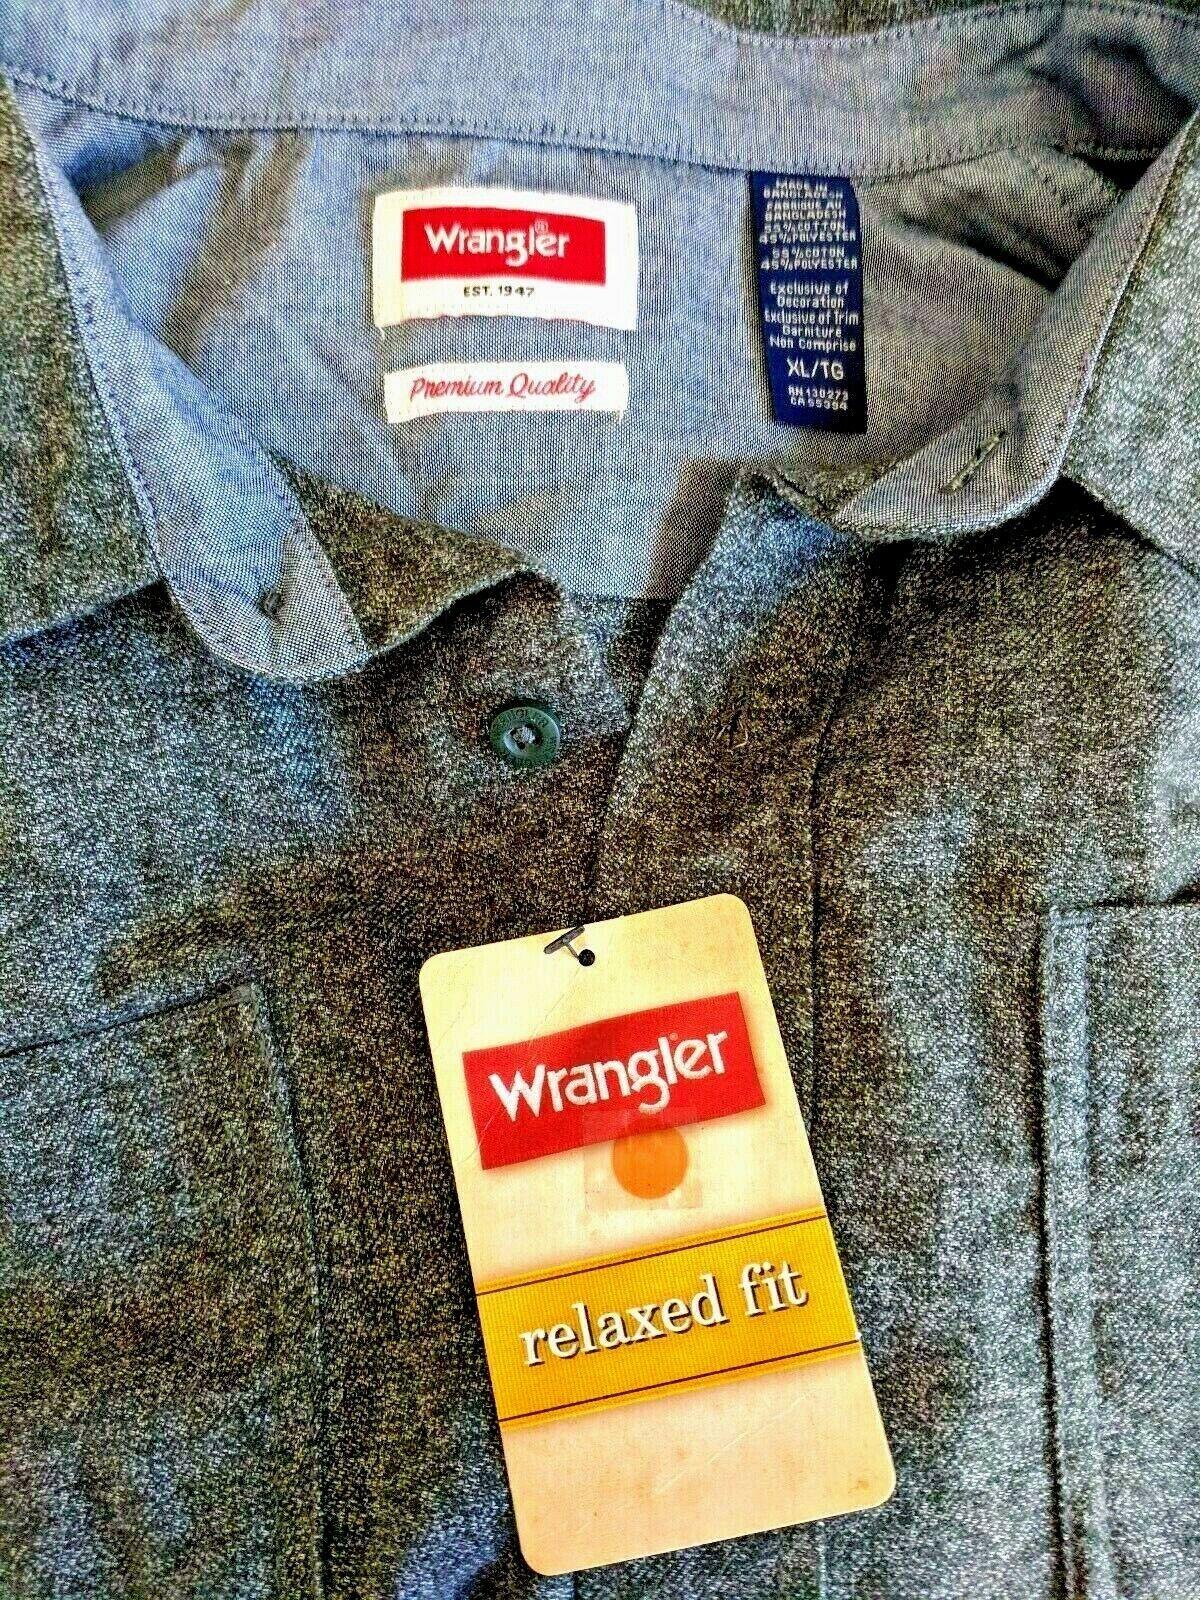 NWT...Men s XL/TG Wrangler Premium Quality , Relaxed Fit, Long Sleeve Shirt - $13.99